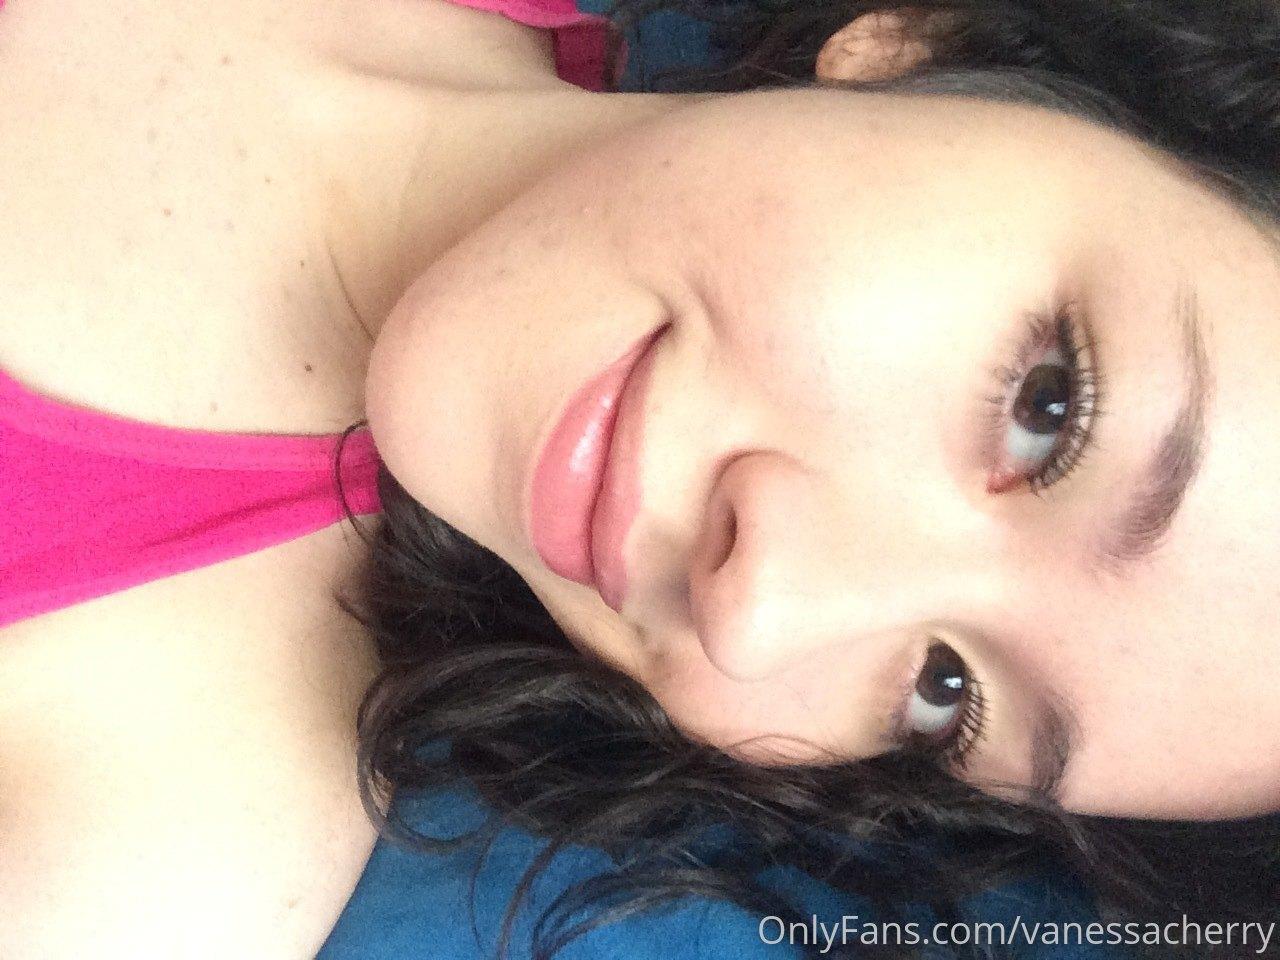 Vanessacherry 0117